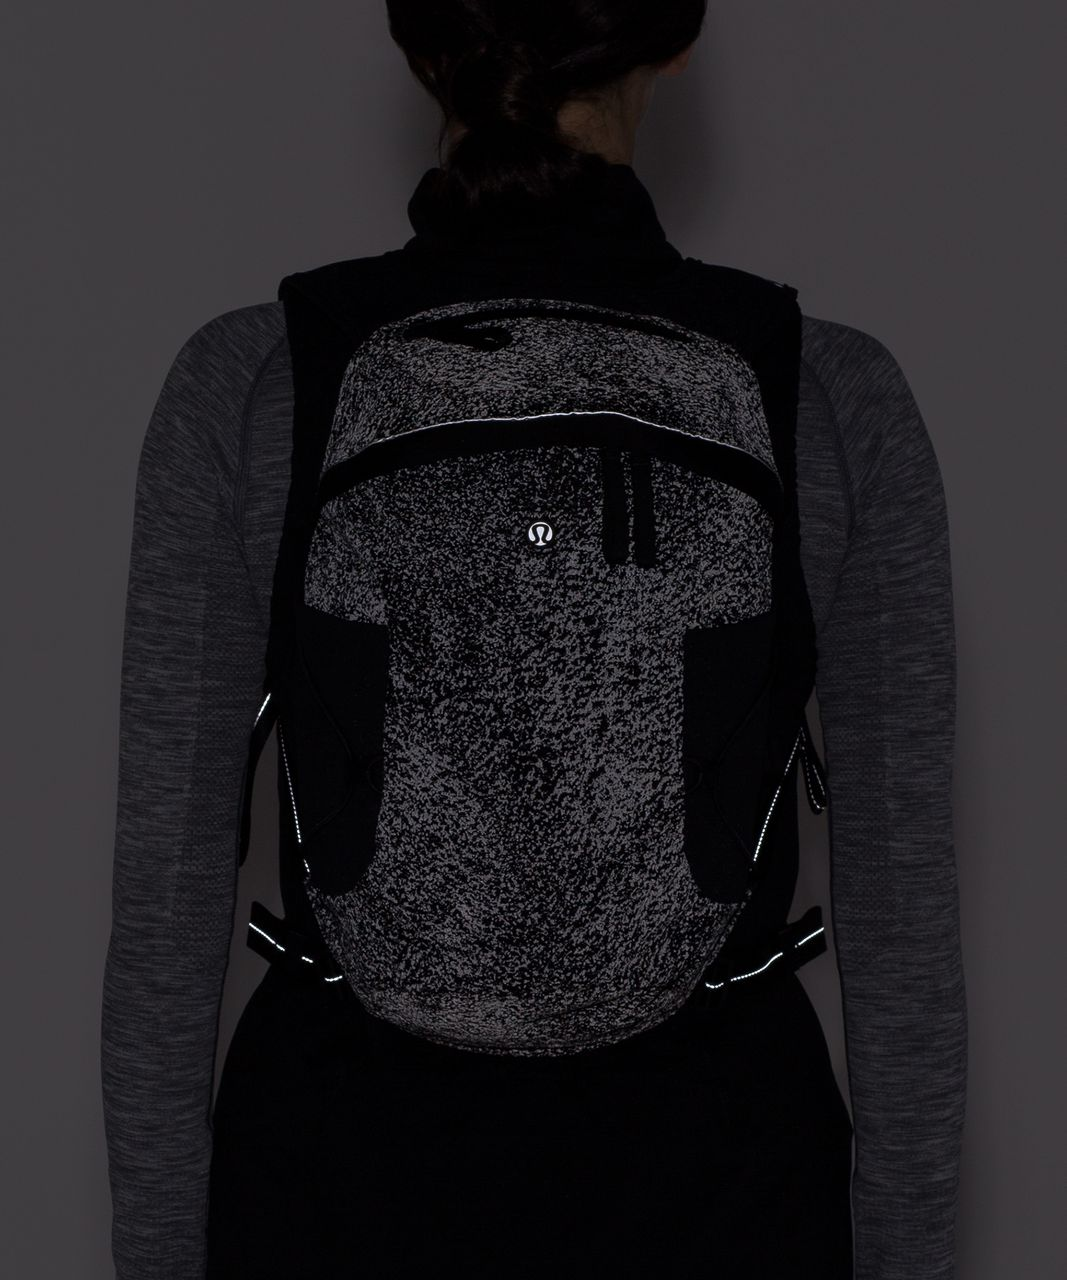 Lululemon Run All Day Backpack II (Reflective) - Glo Wild Black Reflective / Black